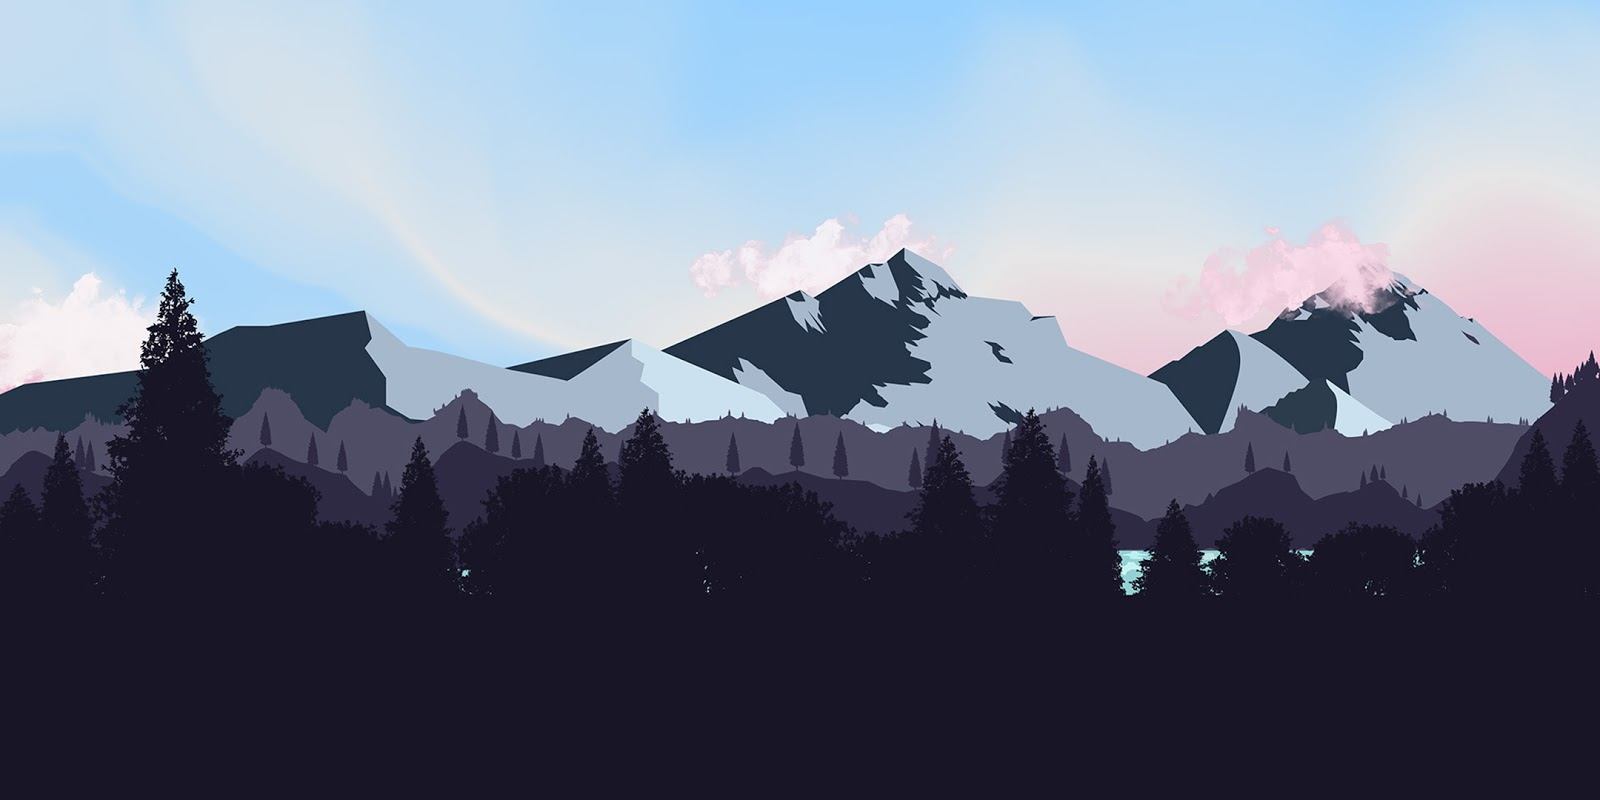 Desktop wallpaper - Minimalist landscape [2160x1920]